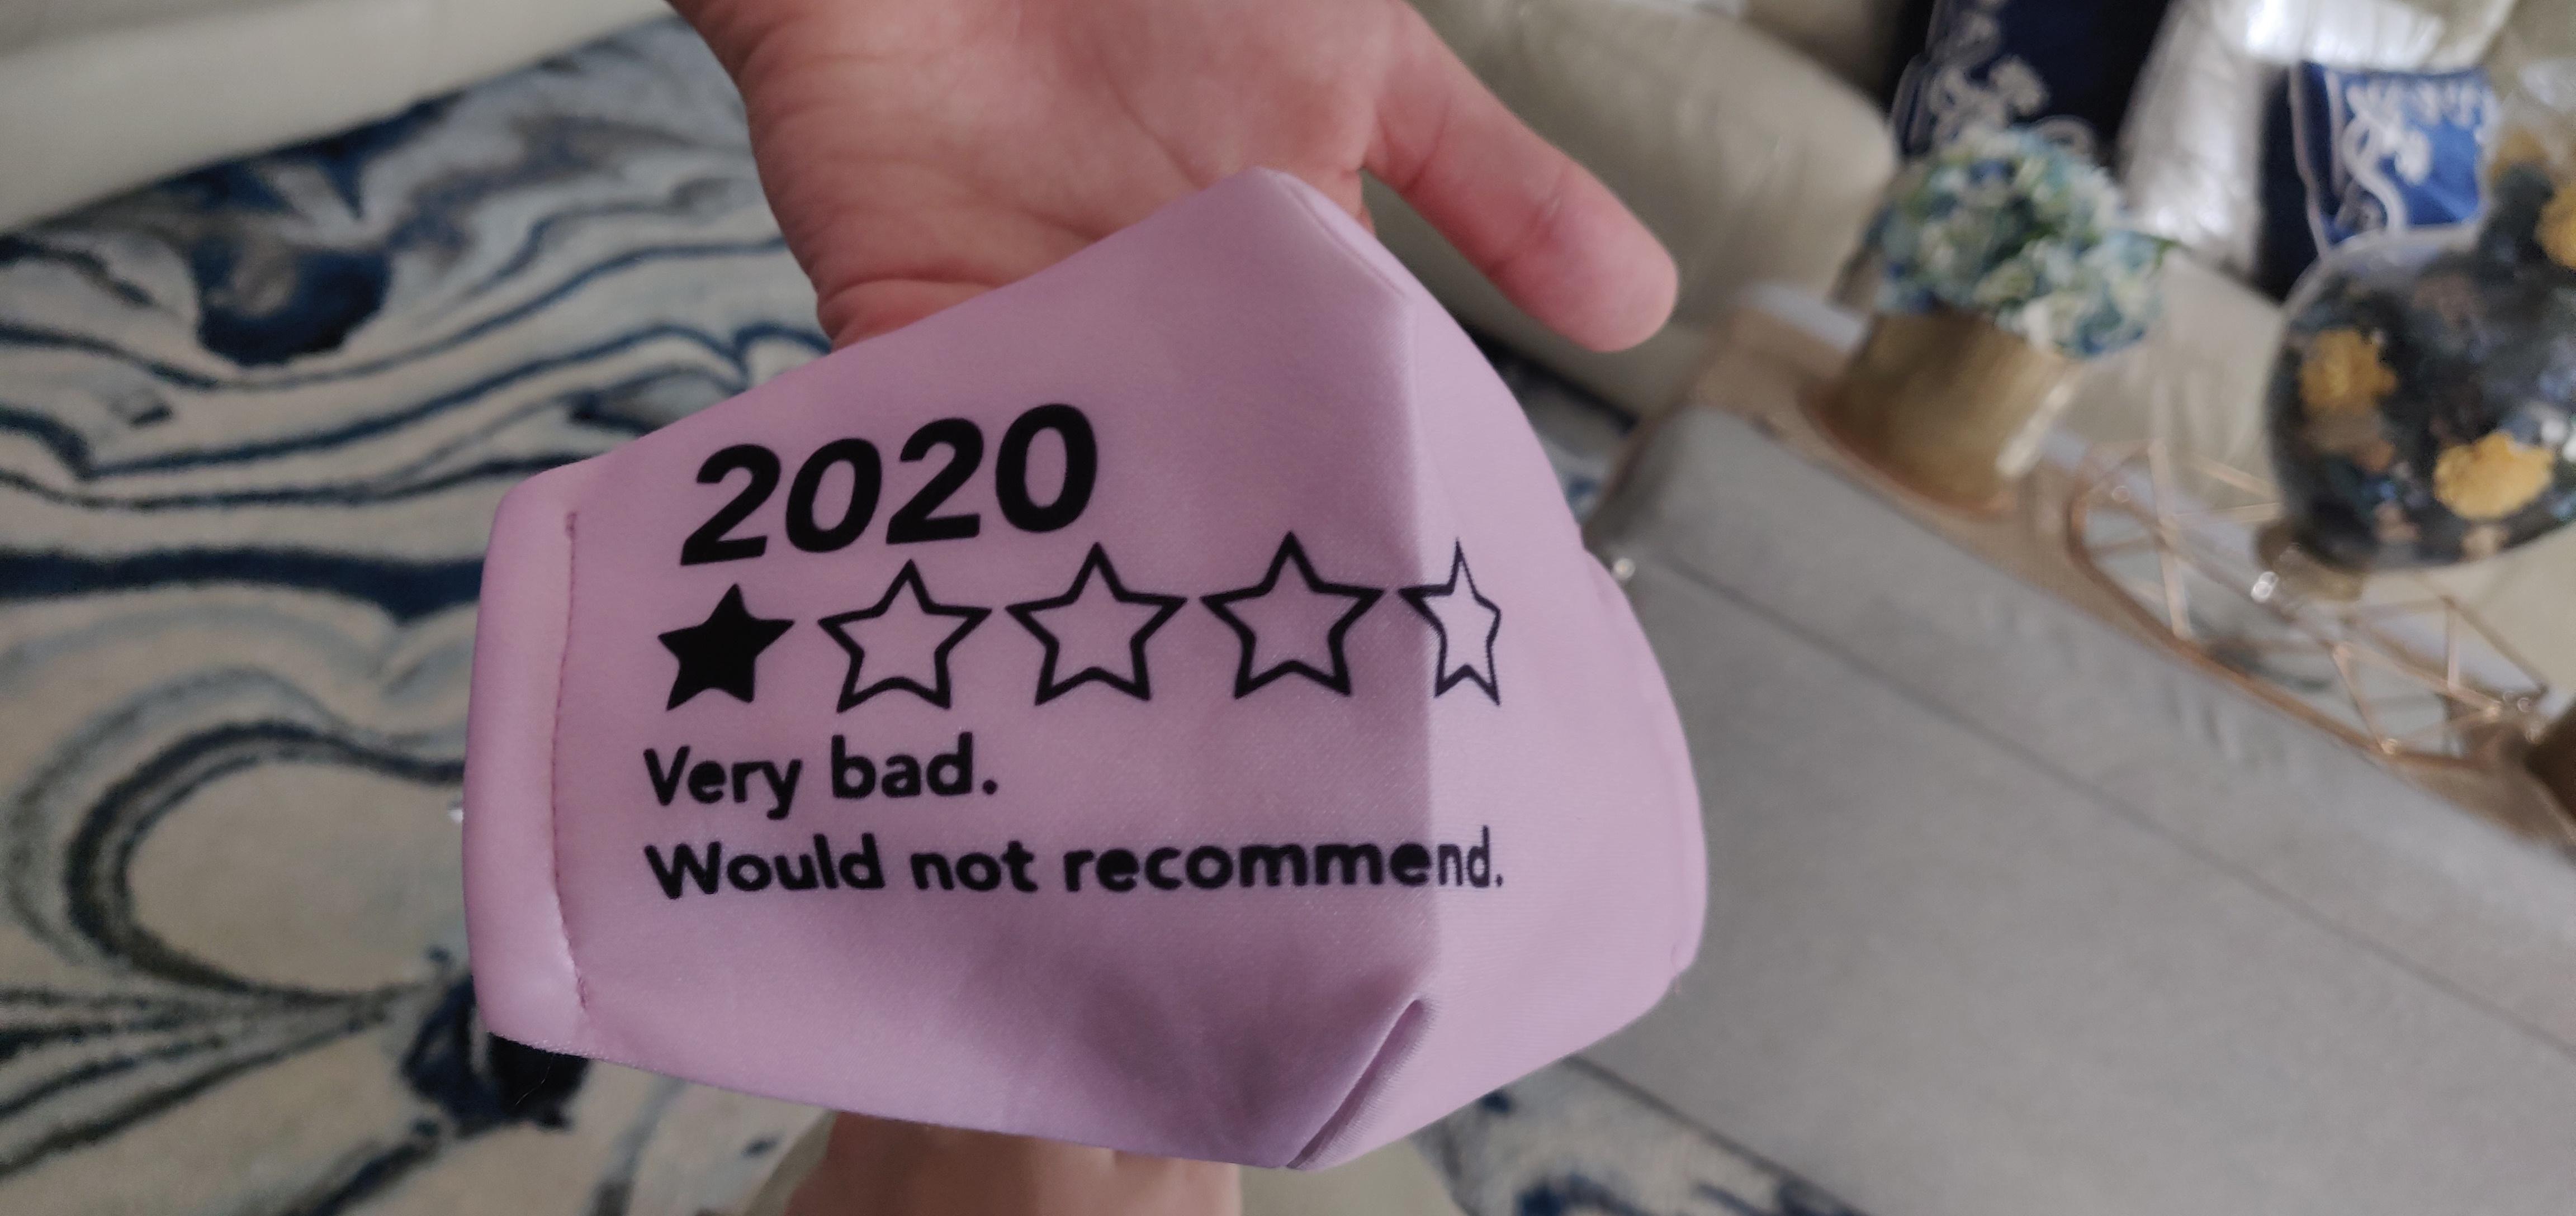 My niece's mask is pretty funny.